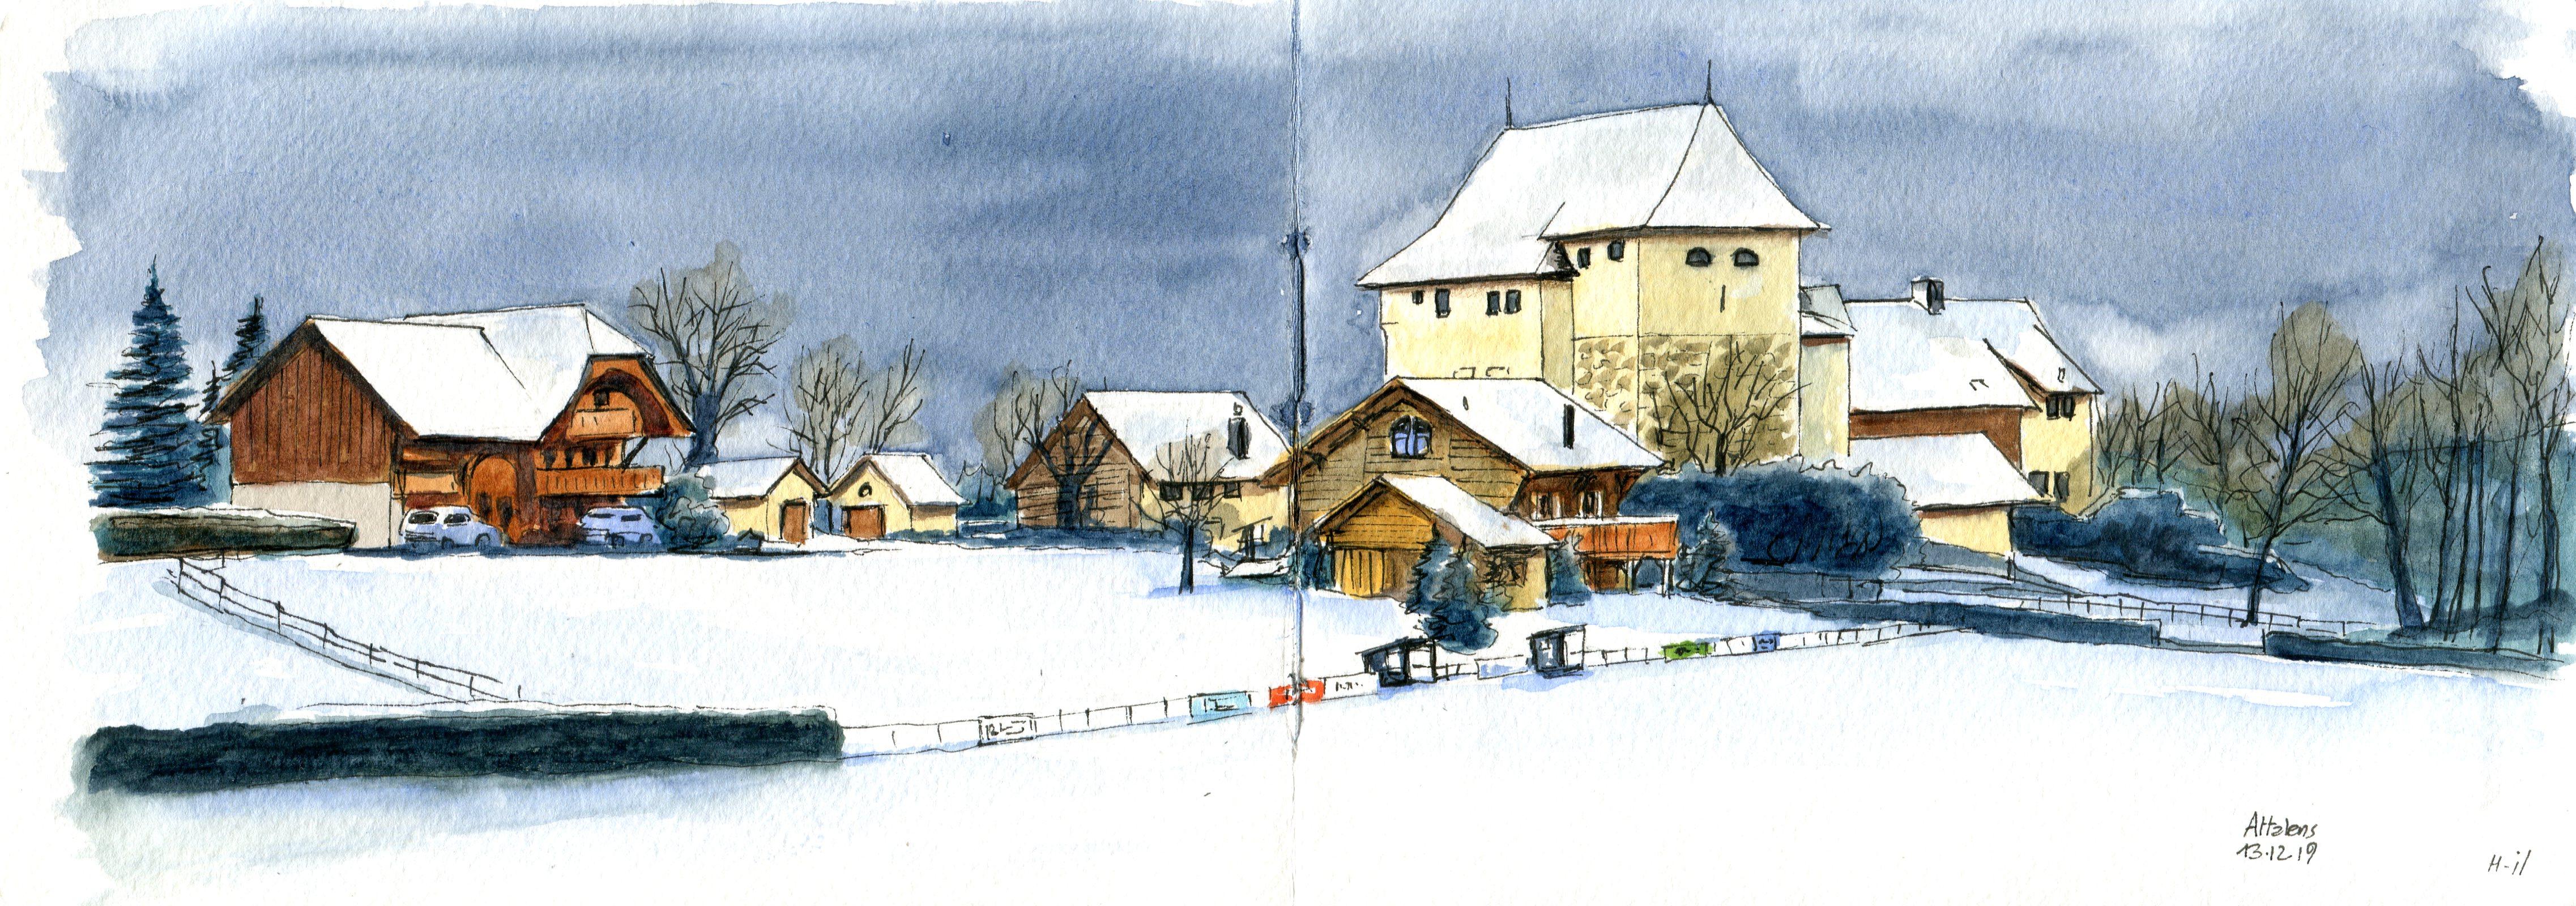 Attalens neige030